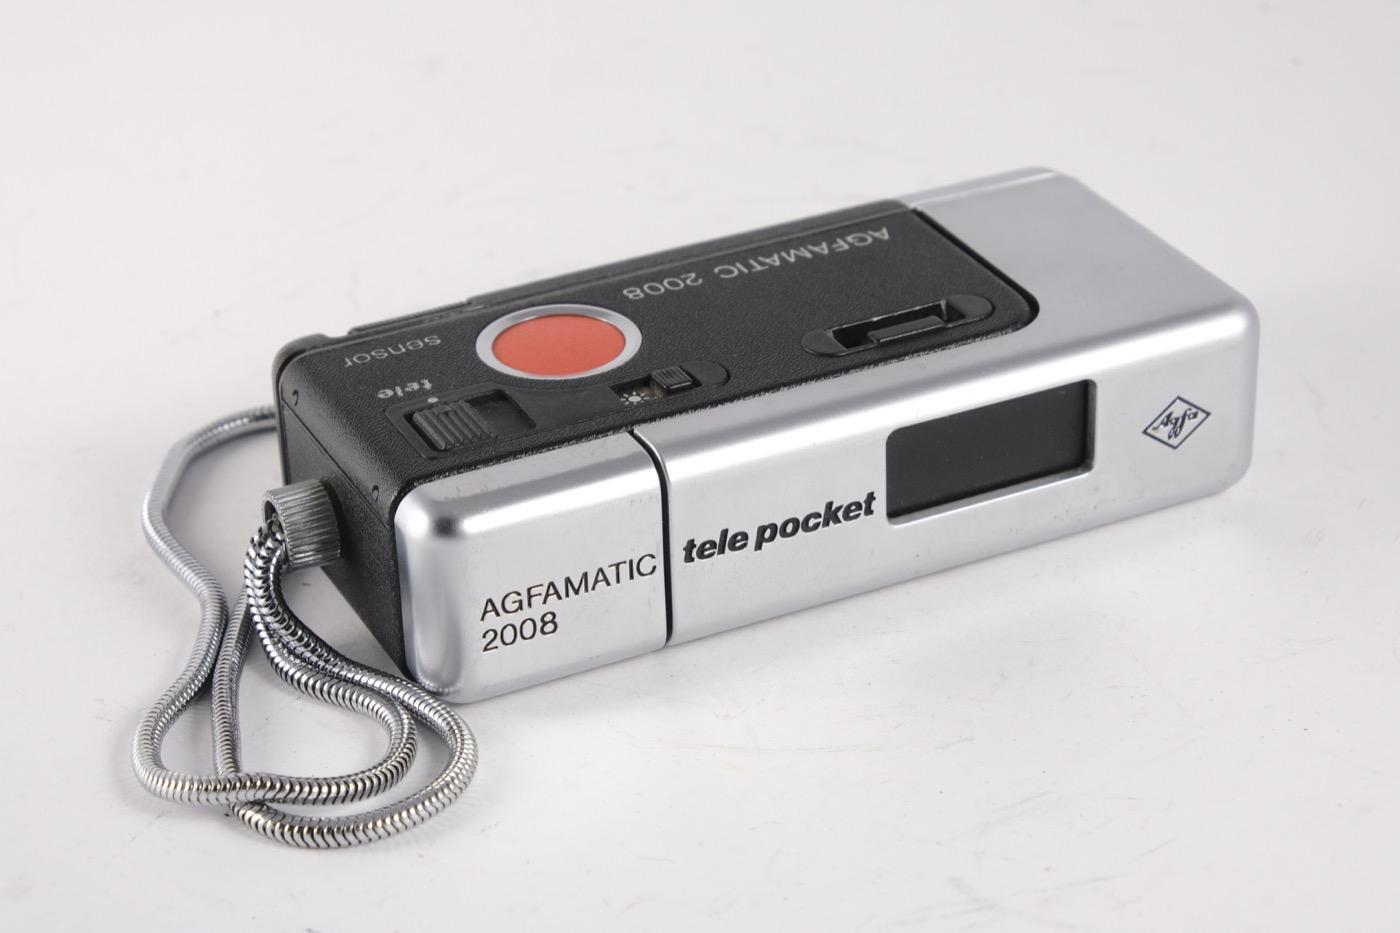 Agfamatic Tele Pocket 2008 Sensor camera